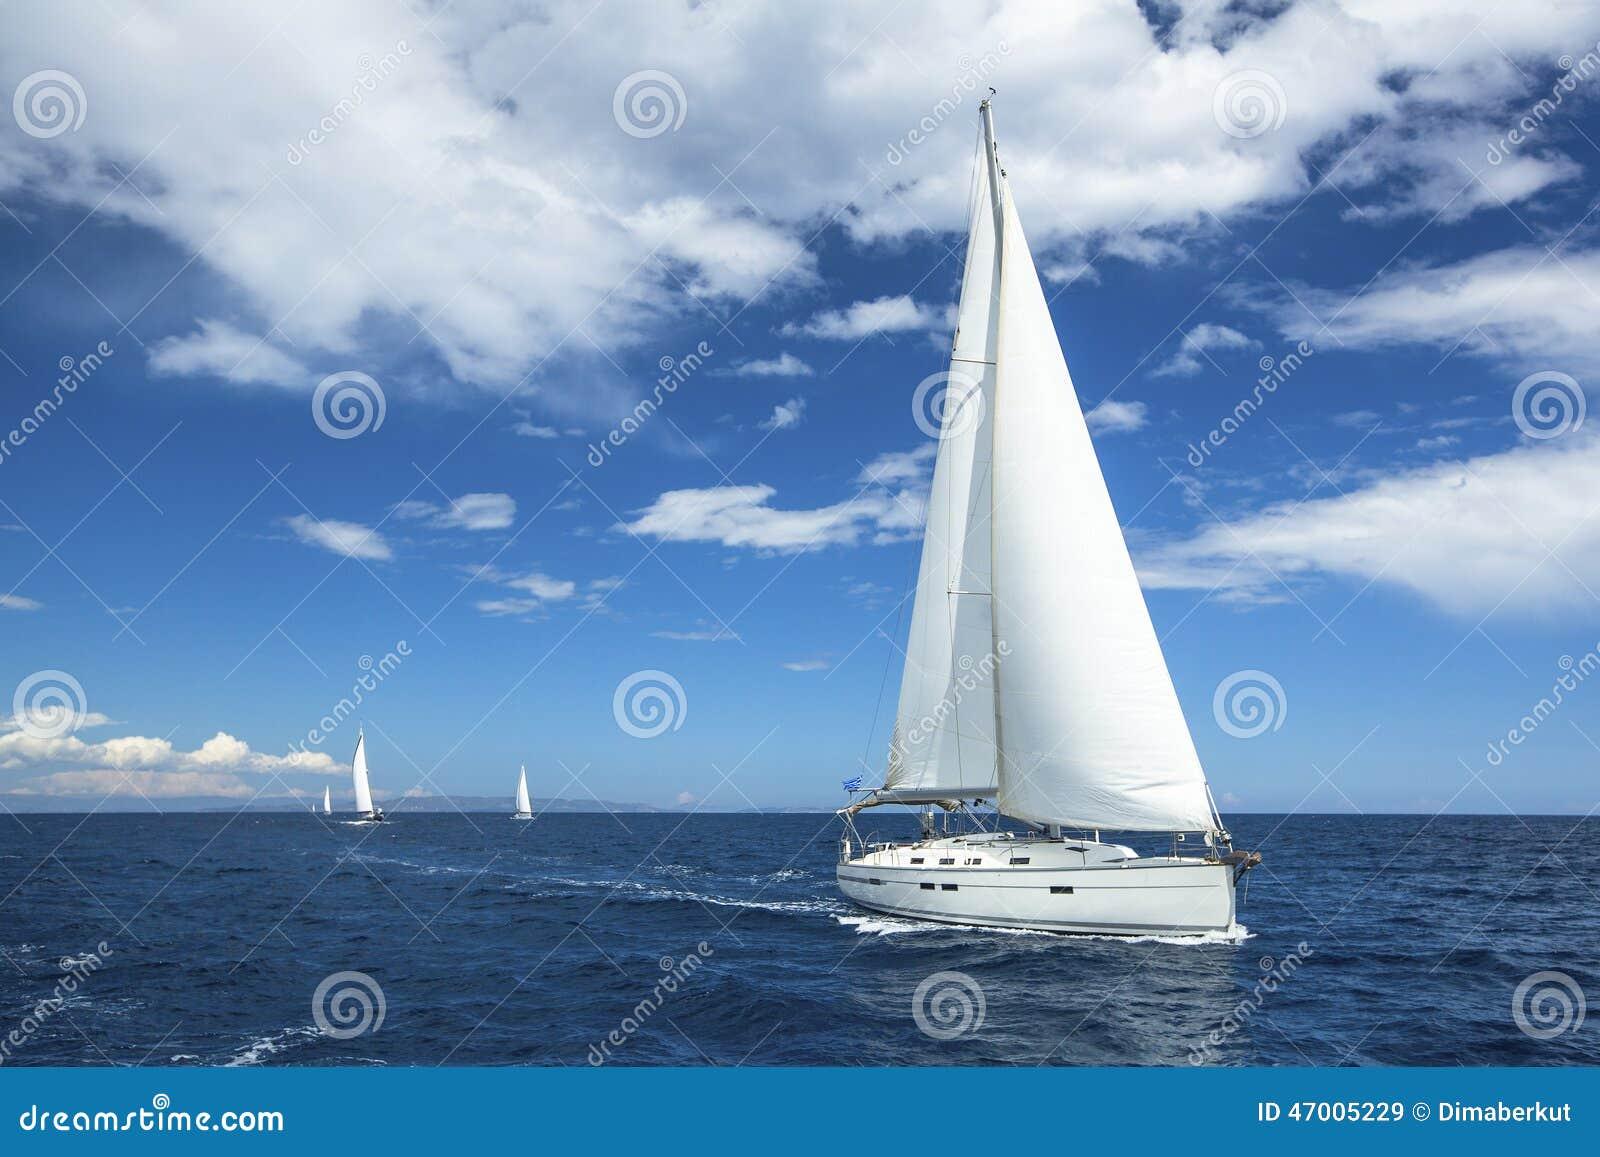 Sailing E Rijen van luxejachten bij jachthavendok Reis